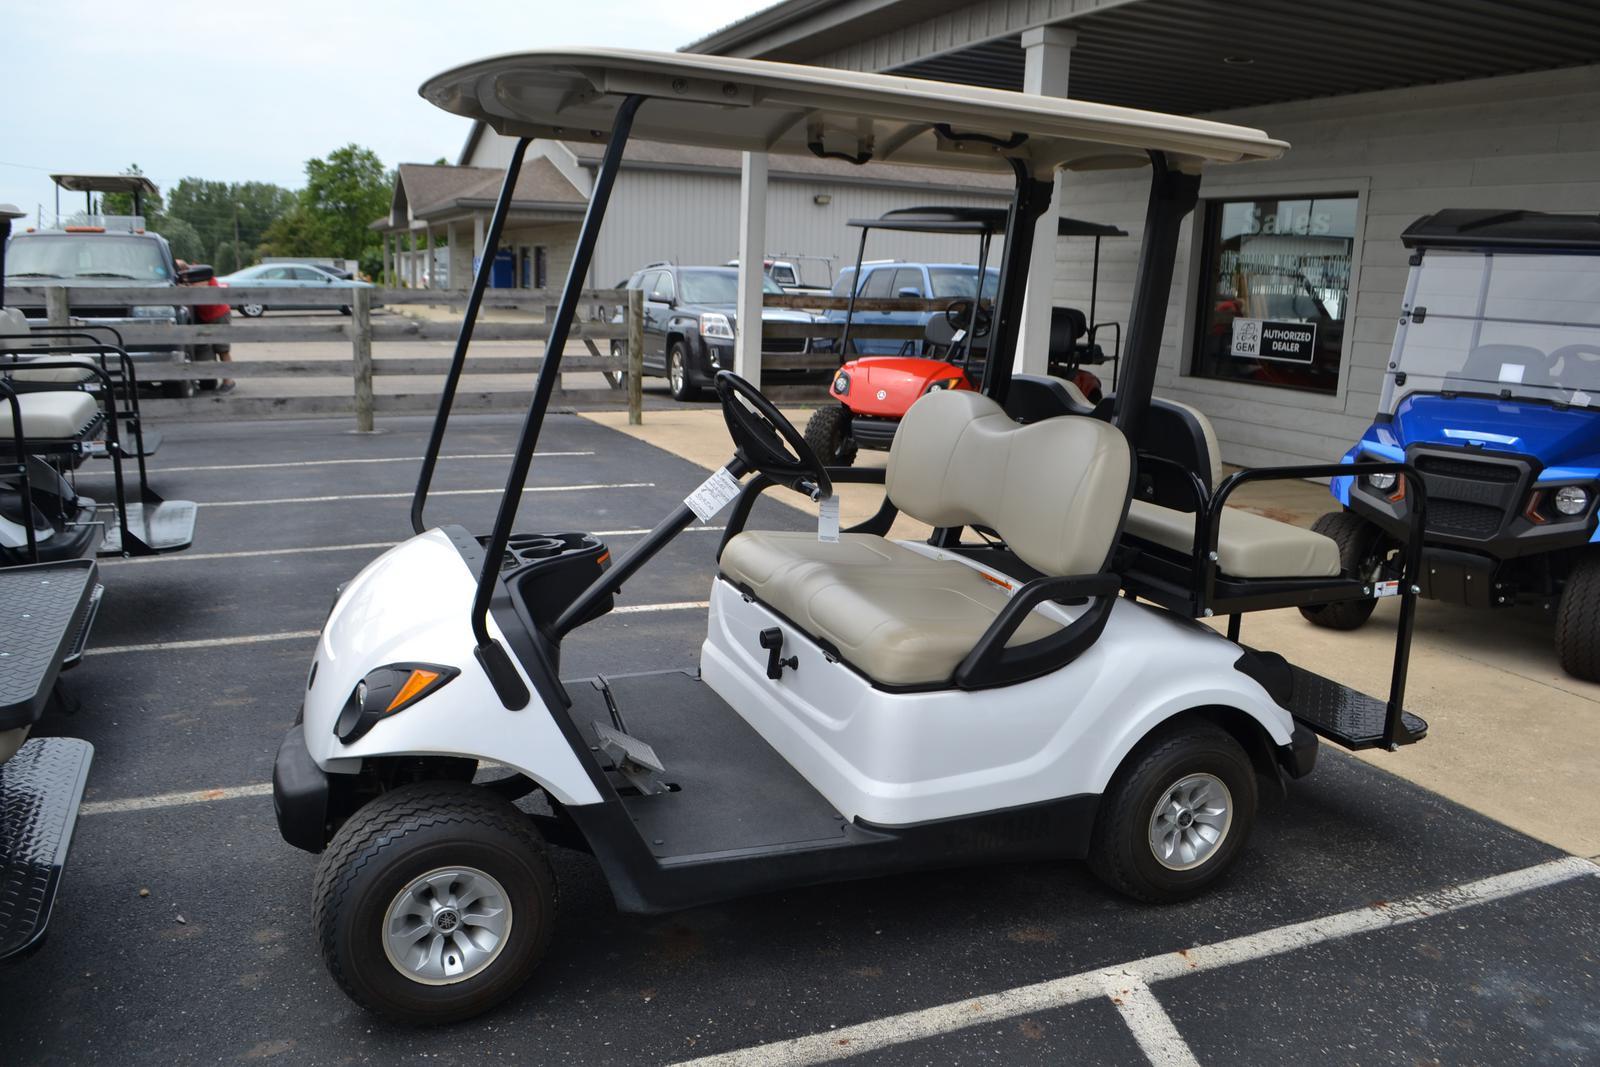 Inventory from Yamaha Mid Ohio Golf Car, Inc. Heath, OH 1 ... on yamaha j55 golf cart, yamaha ydra golf cart accessories, yamaha ydre golf cart accessories,